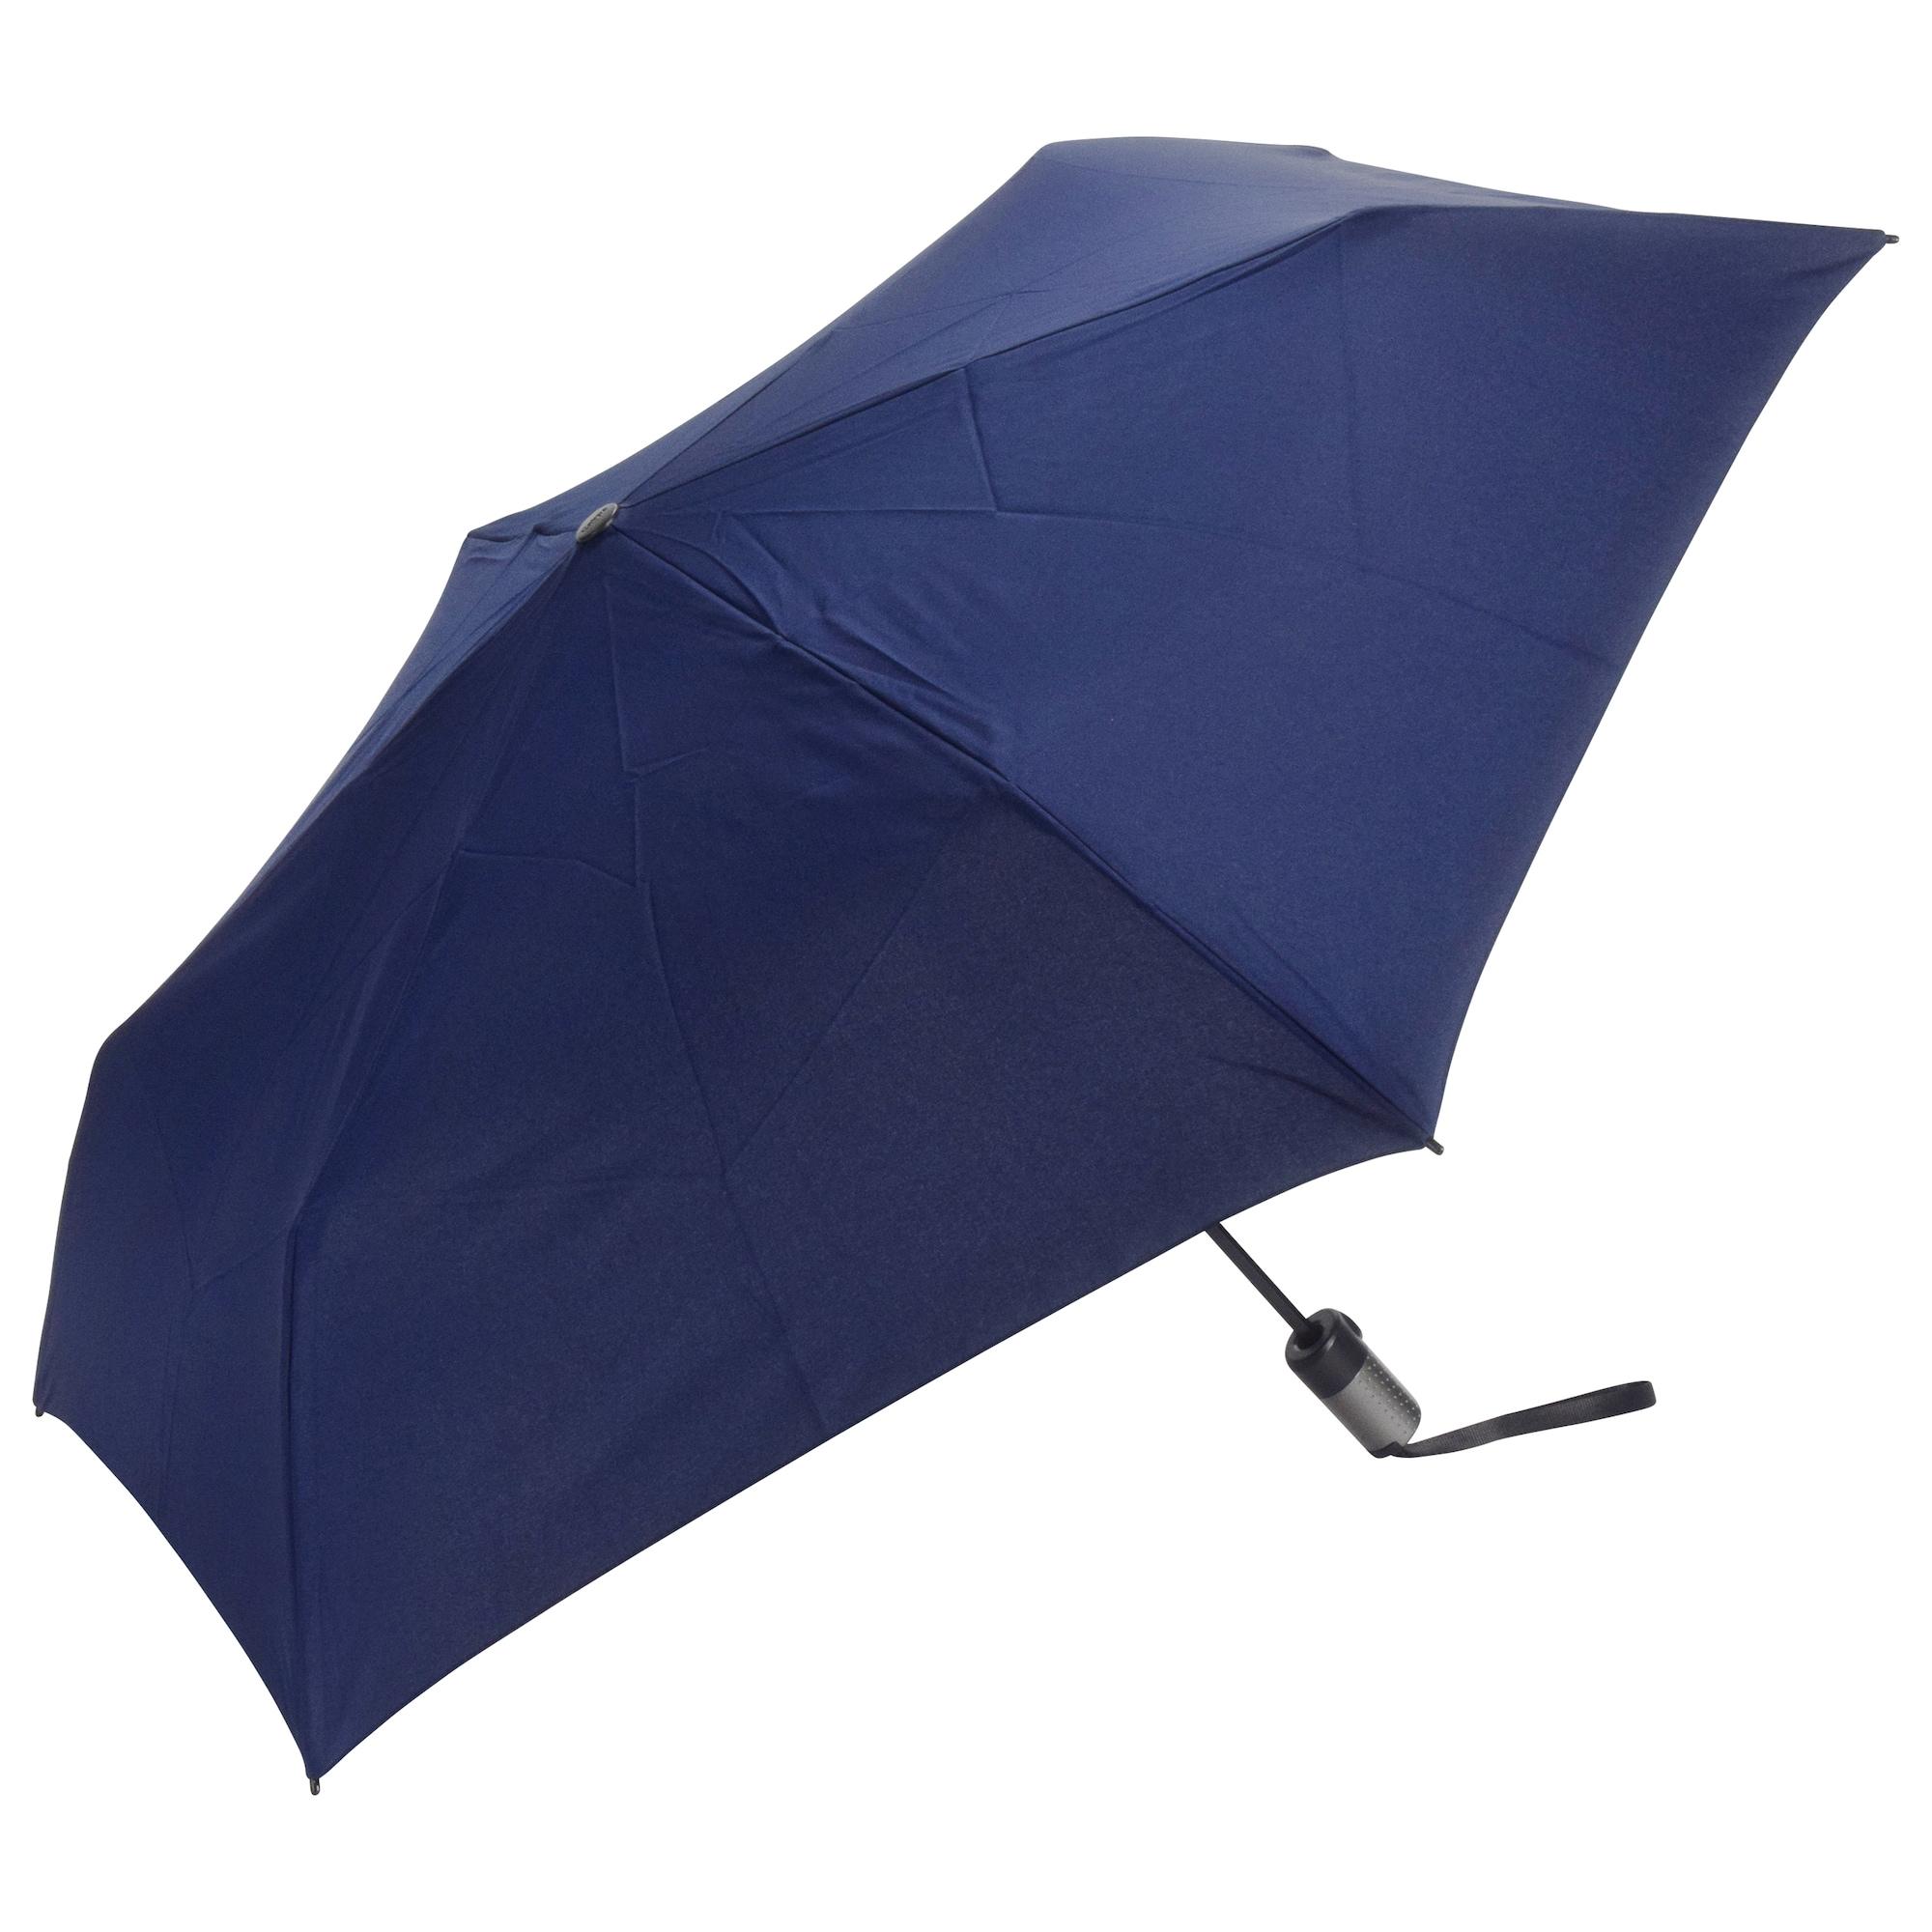 Taschenschirm 'TS.200' 29 cm | Accessoires > Regenschirme > Taschenschirme | knirps